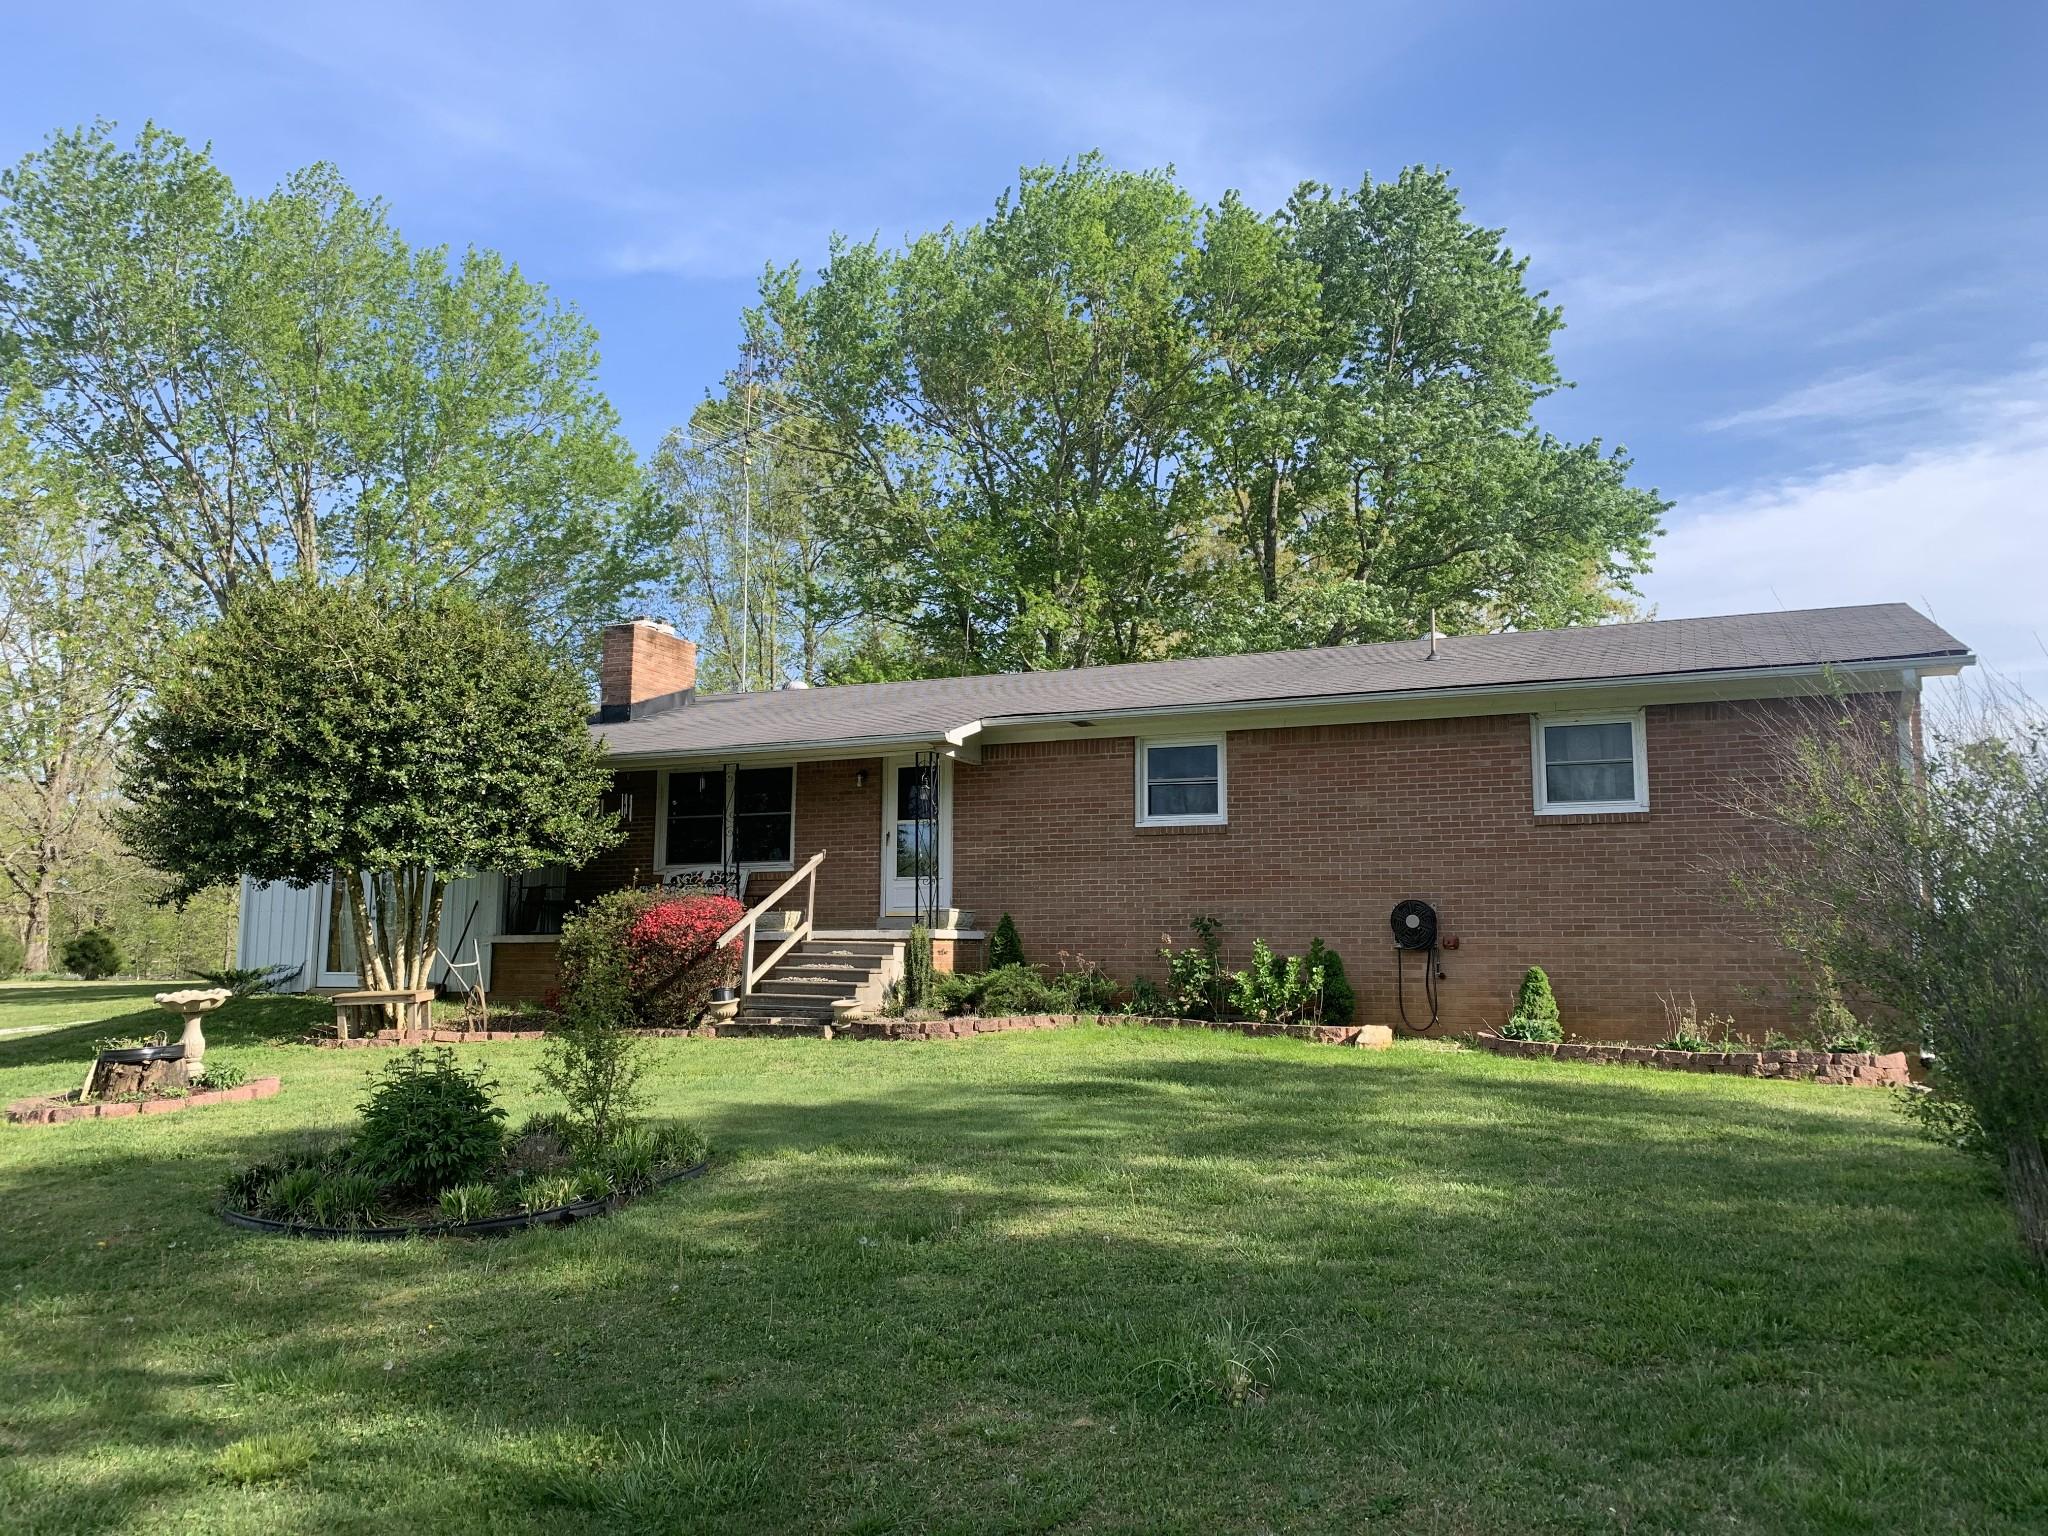 788 Glenn Springs Rd Property Photo - Lawrenceburg, TN real estate listing